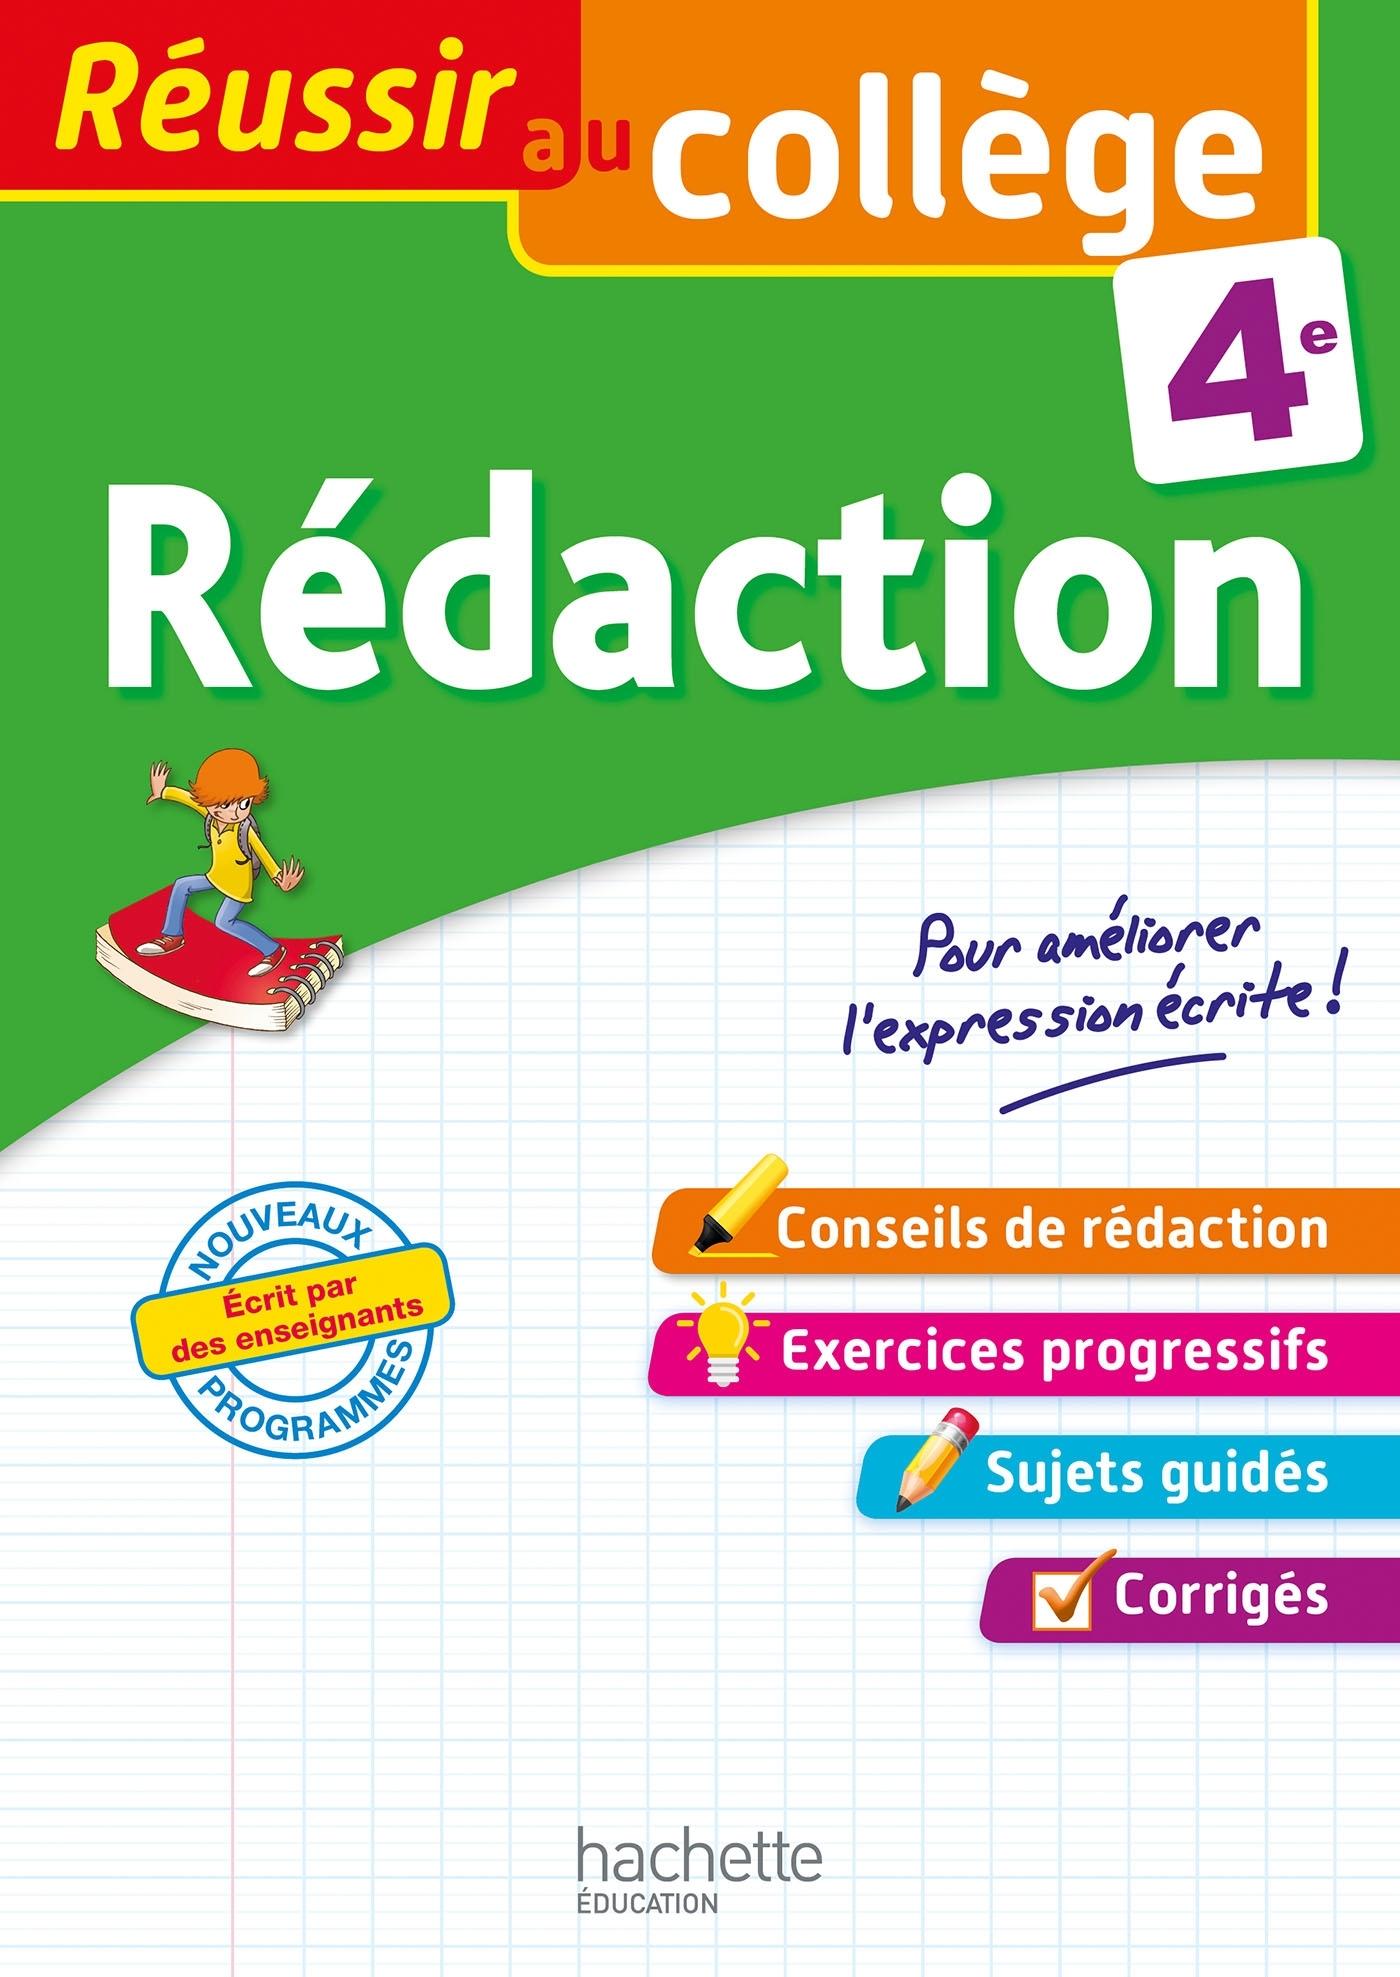 REUSSIR AU COLLEGE - REDACTION 4E